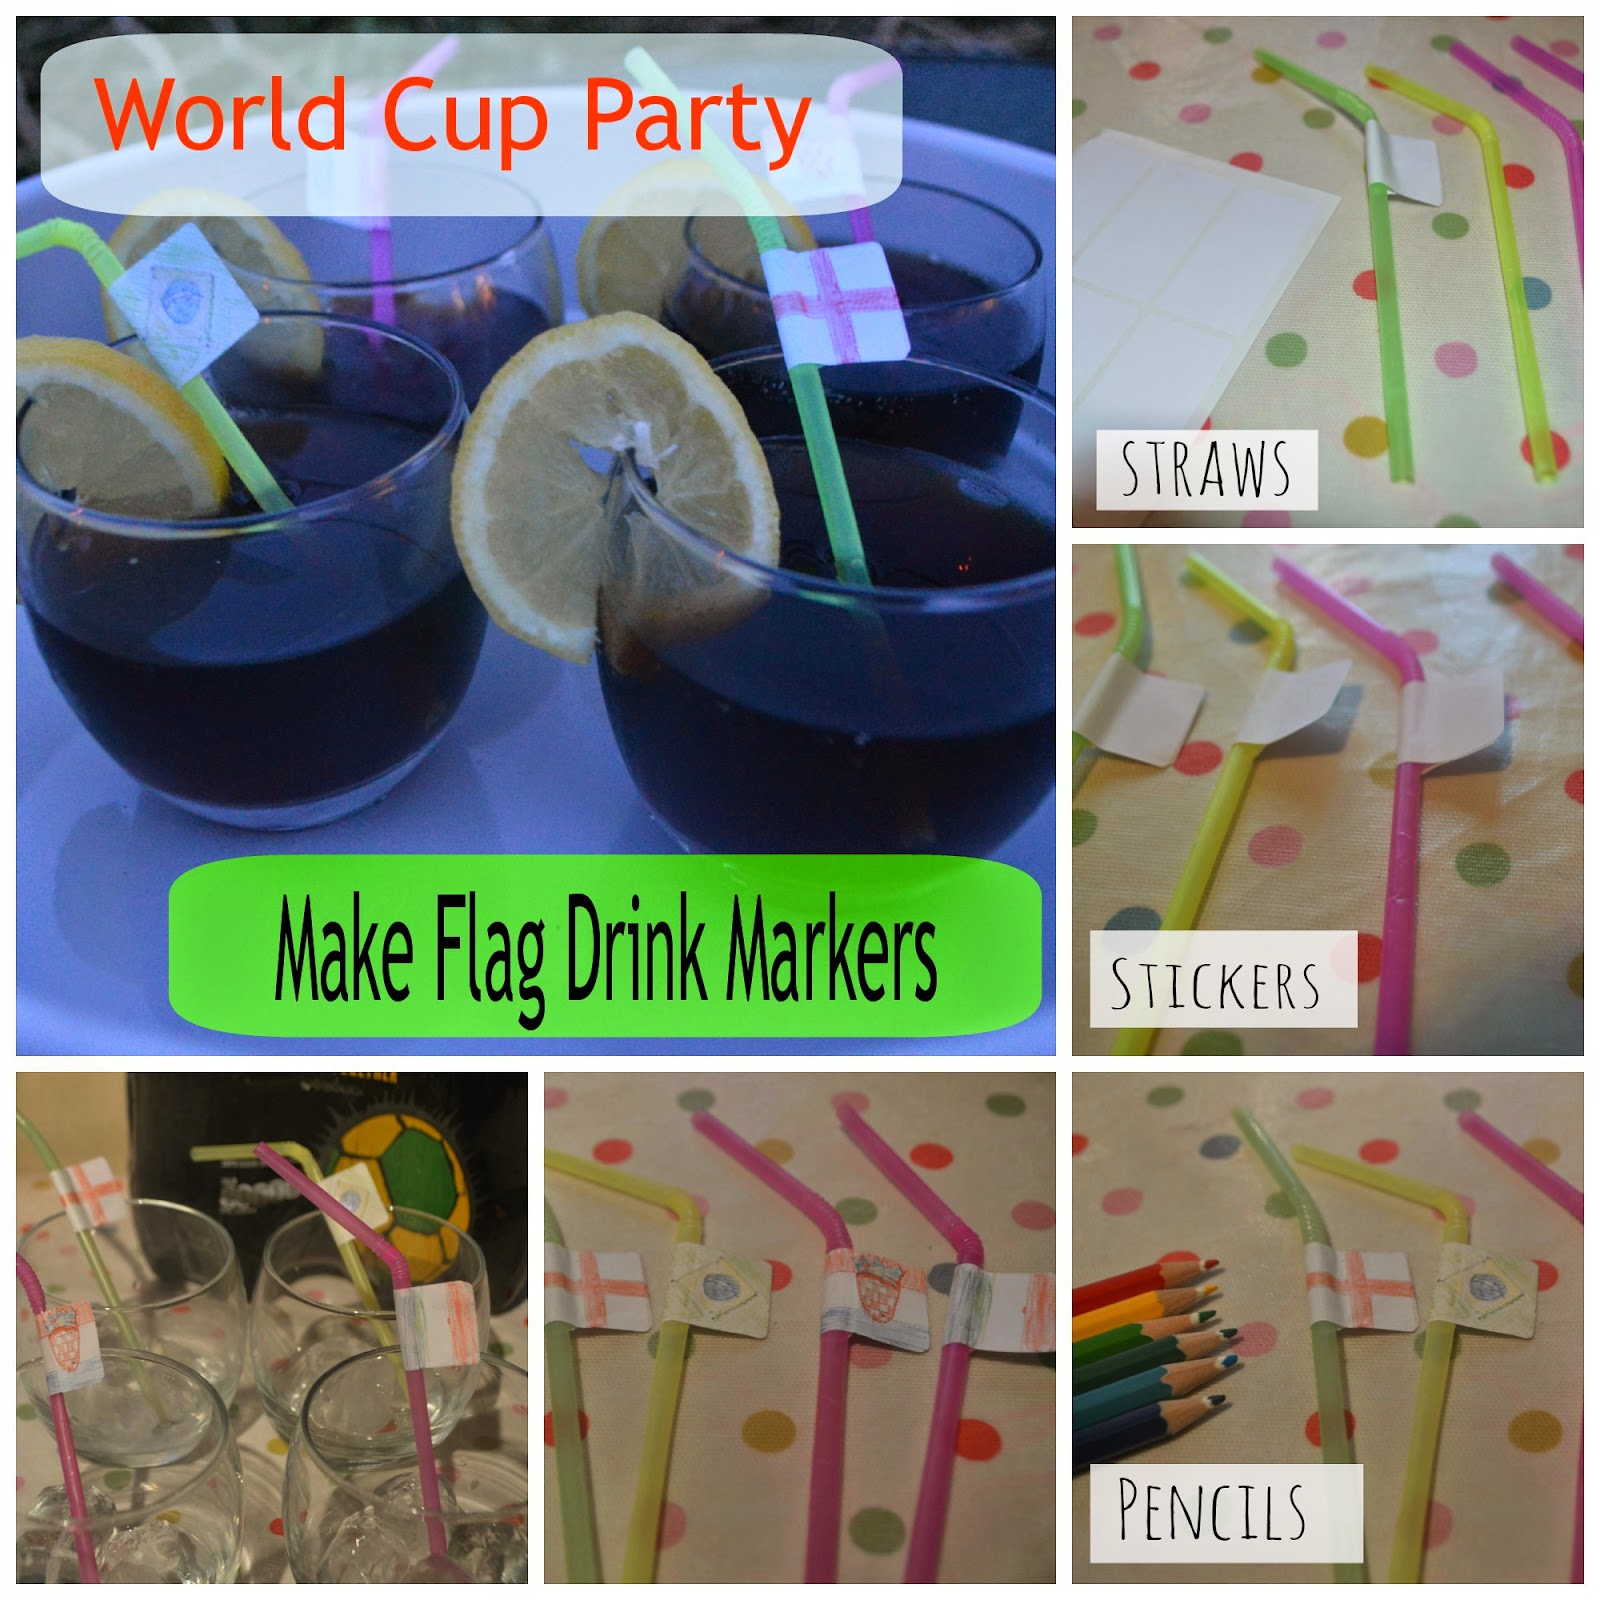 Flag Drink Markers Craft Big Match Planner Party Coca Cola Zero Refreshments CBIAS FIFA World Cup Brazil 2014